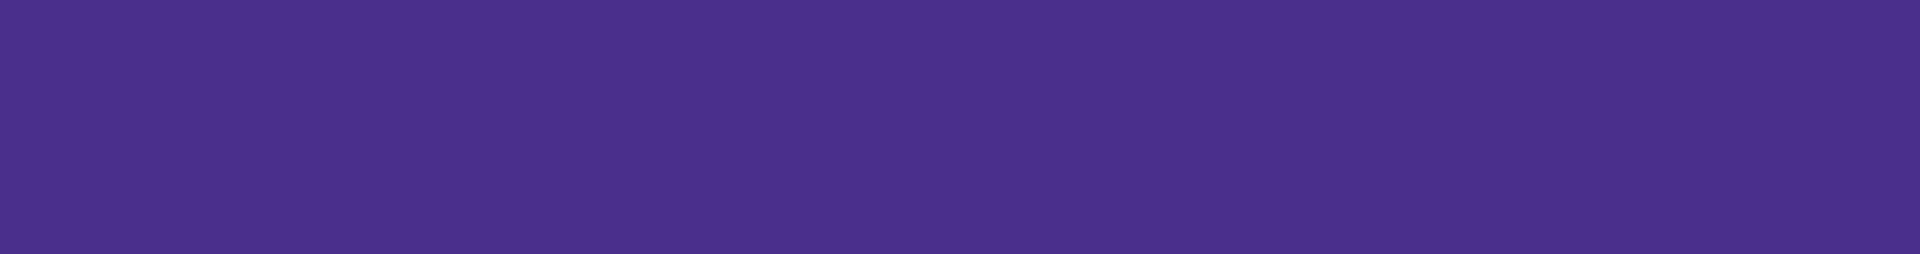 kuwait-skyline-pp